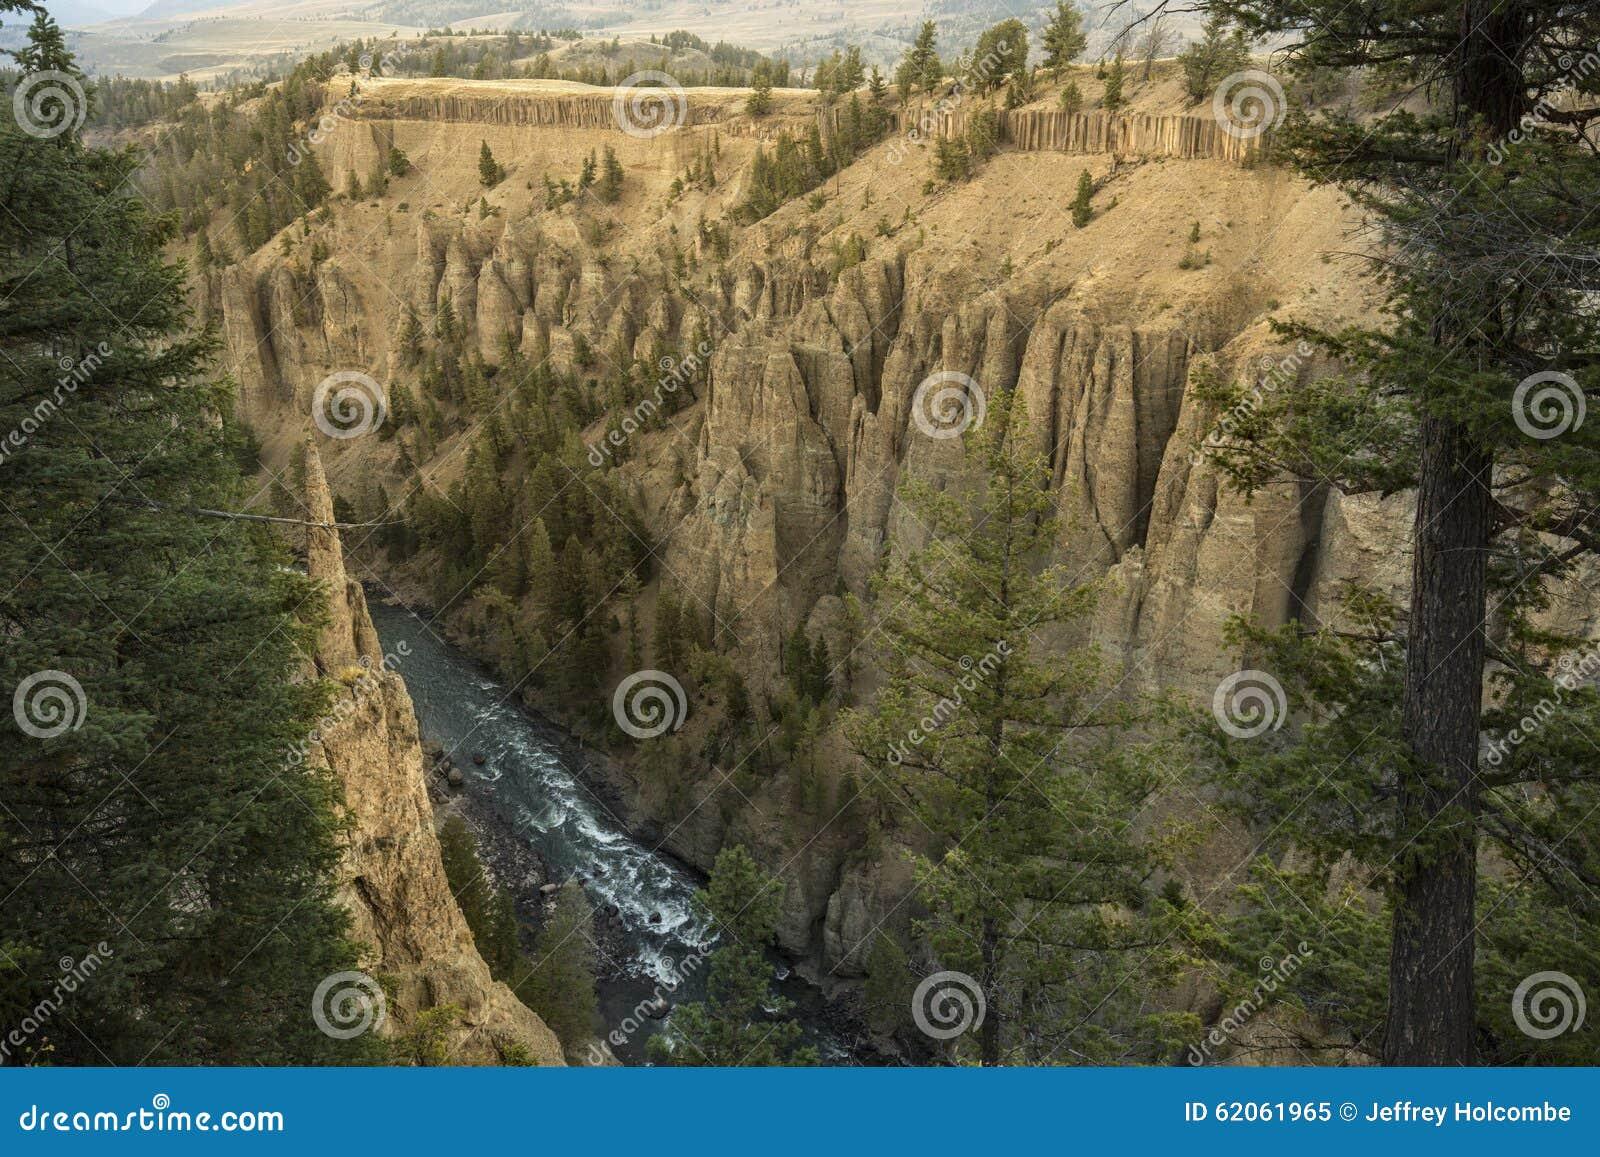 Photo Gallery (U.S. National Park Service)